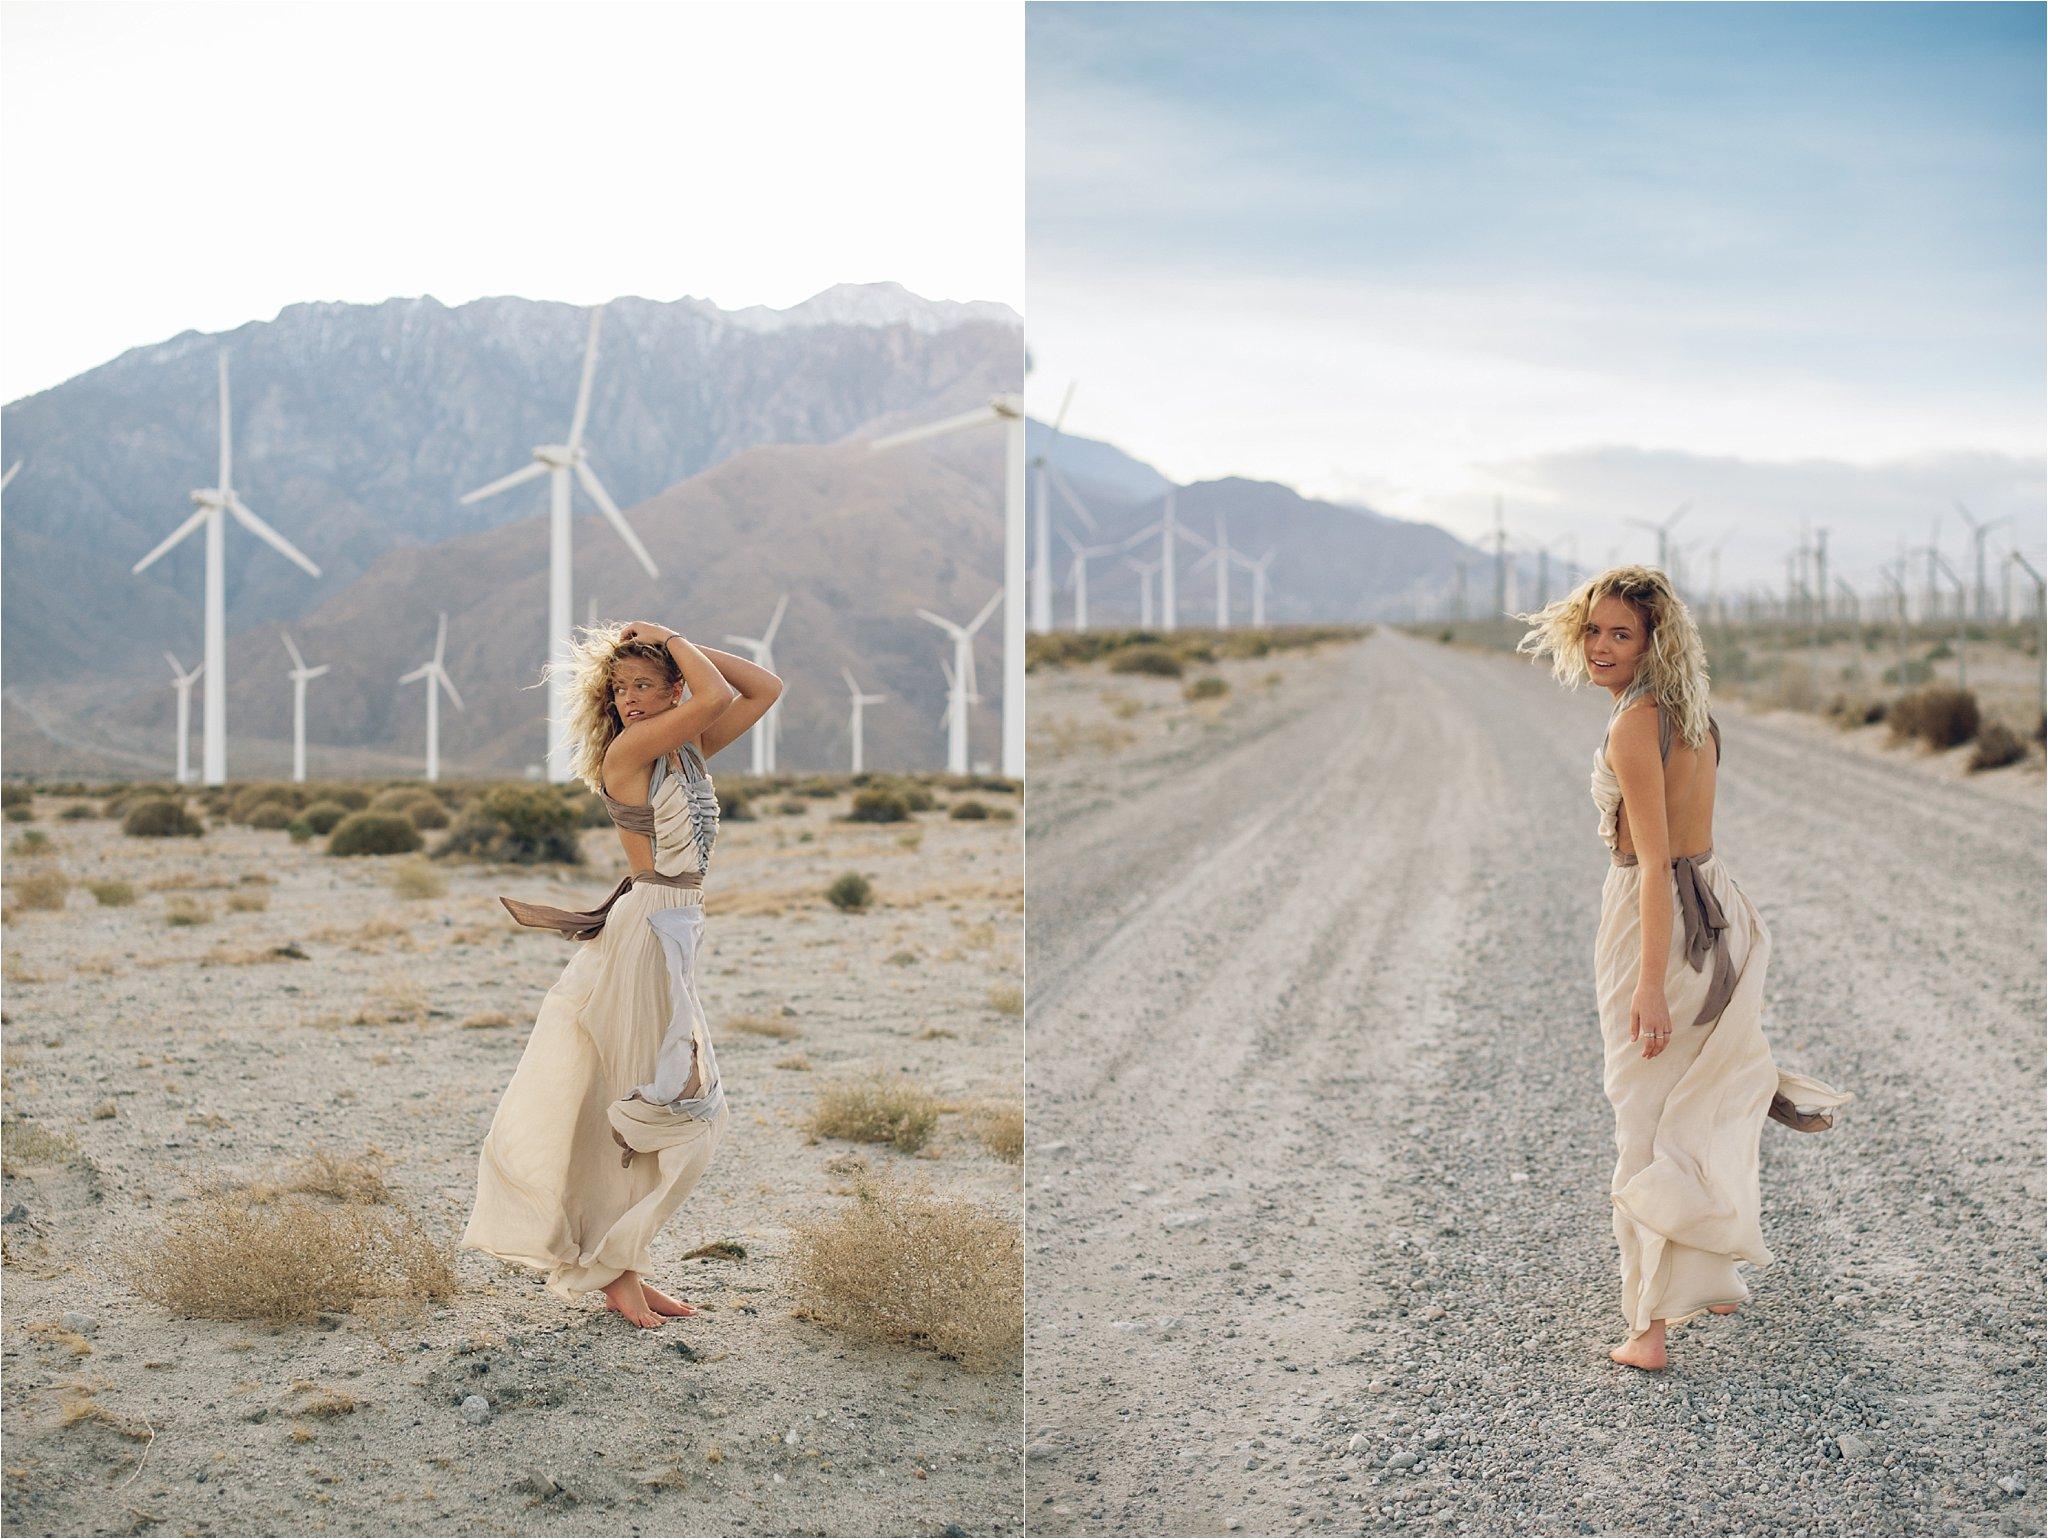 03-Senior-Photographer-Workshop-CA-Desert.jpg